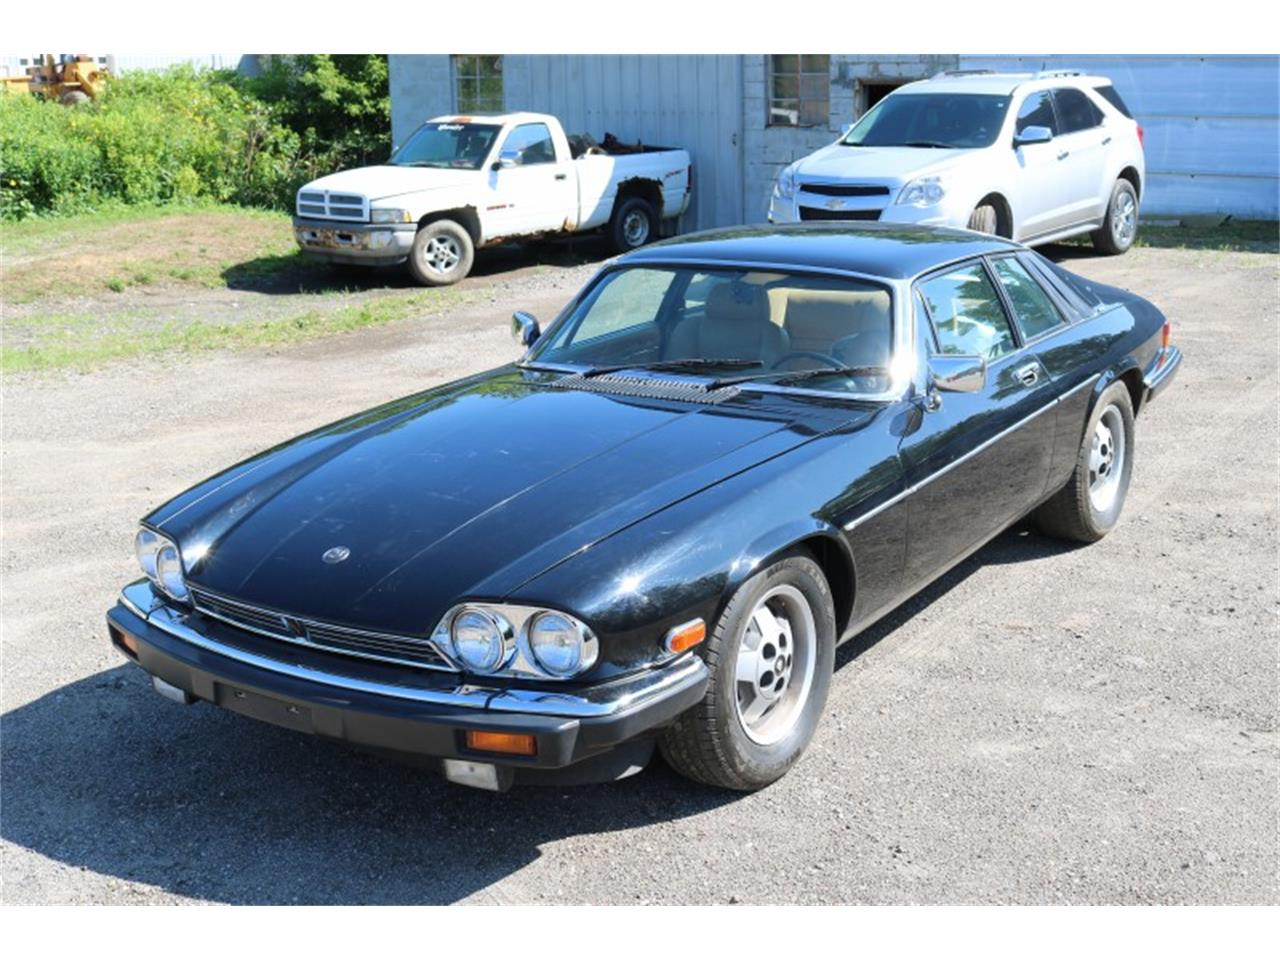 1983 Jaguar XJS for sale in Livonia, MI / classiccarsbay.com